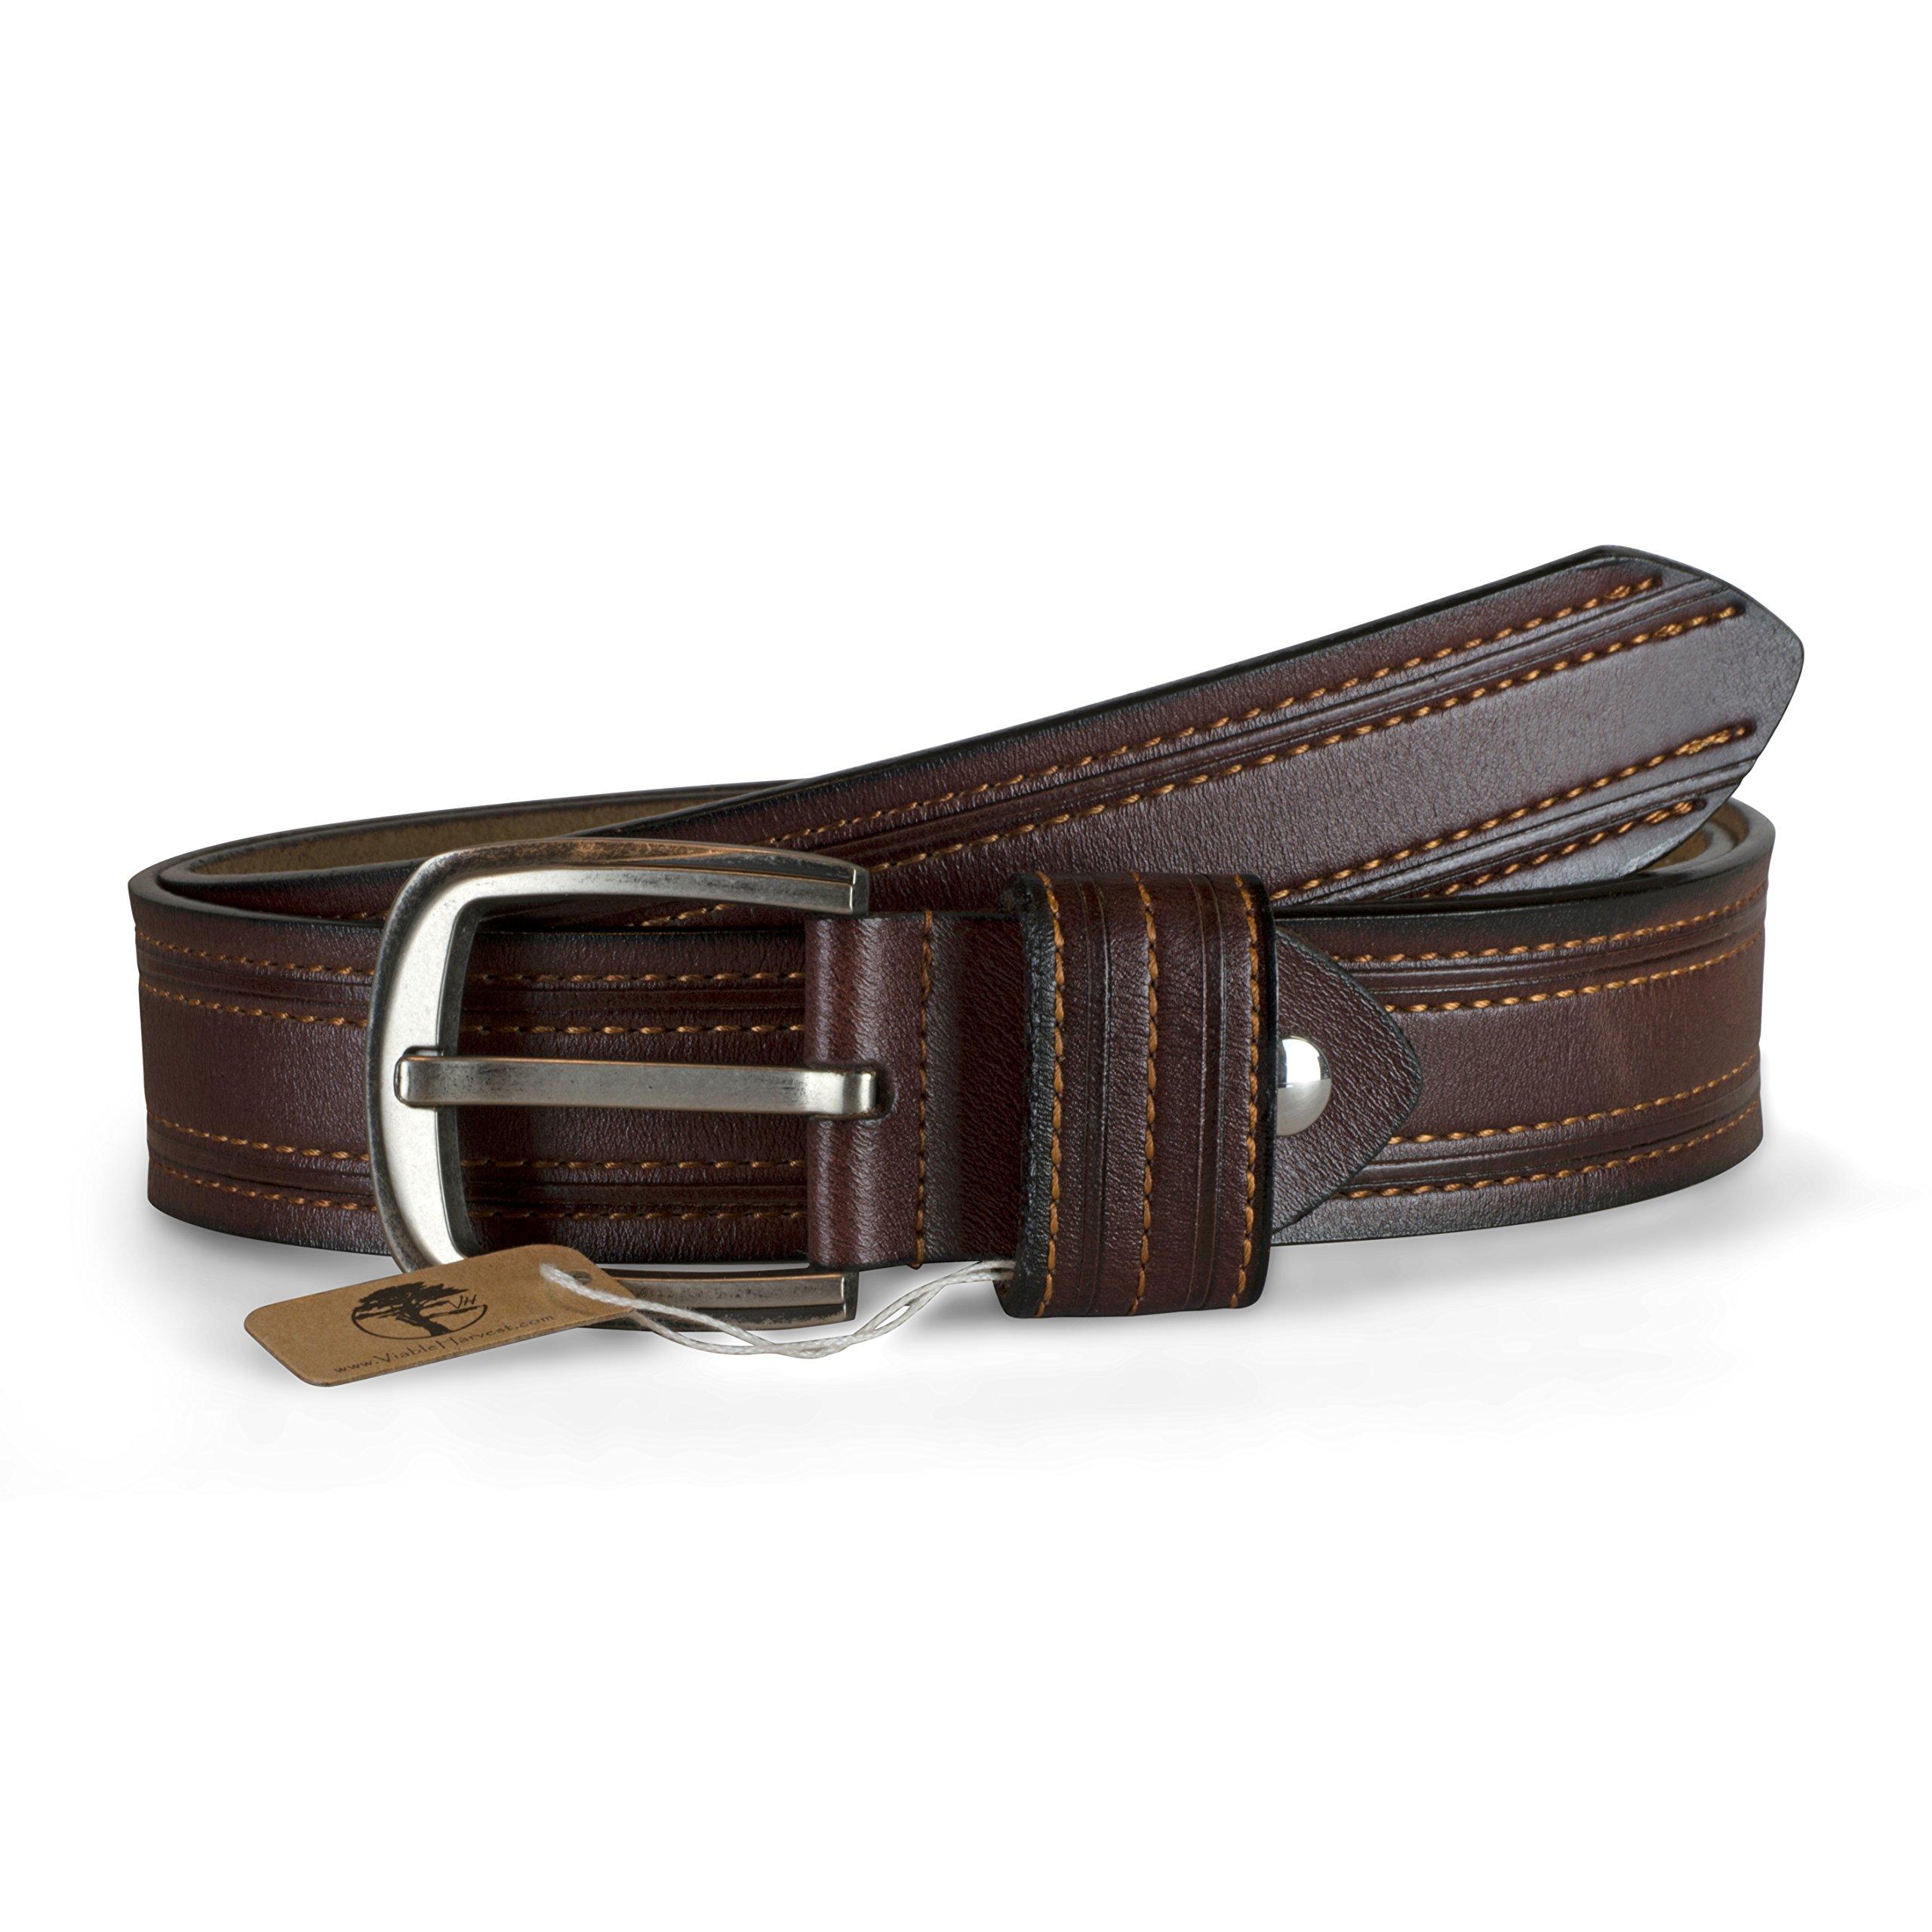 Viable Harvest Men's Professional Double Stitched Genuine Leather Belt (Med Brown)